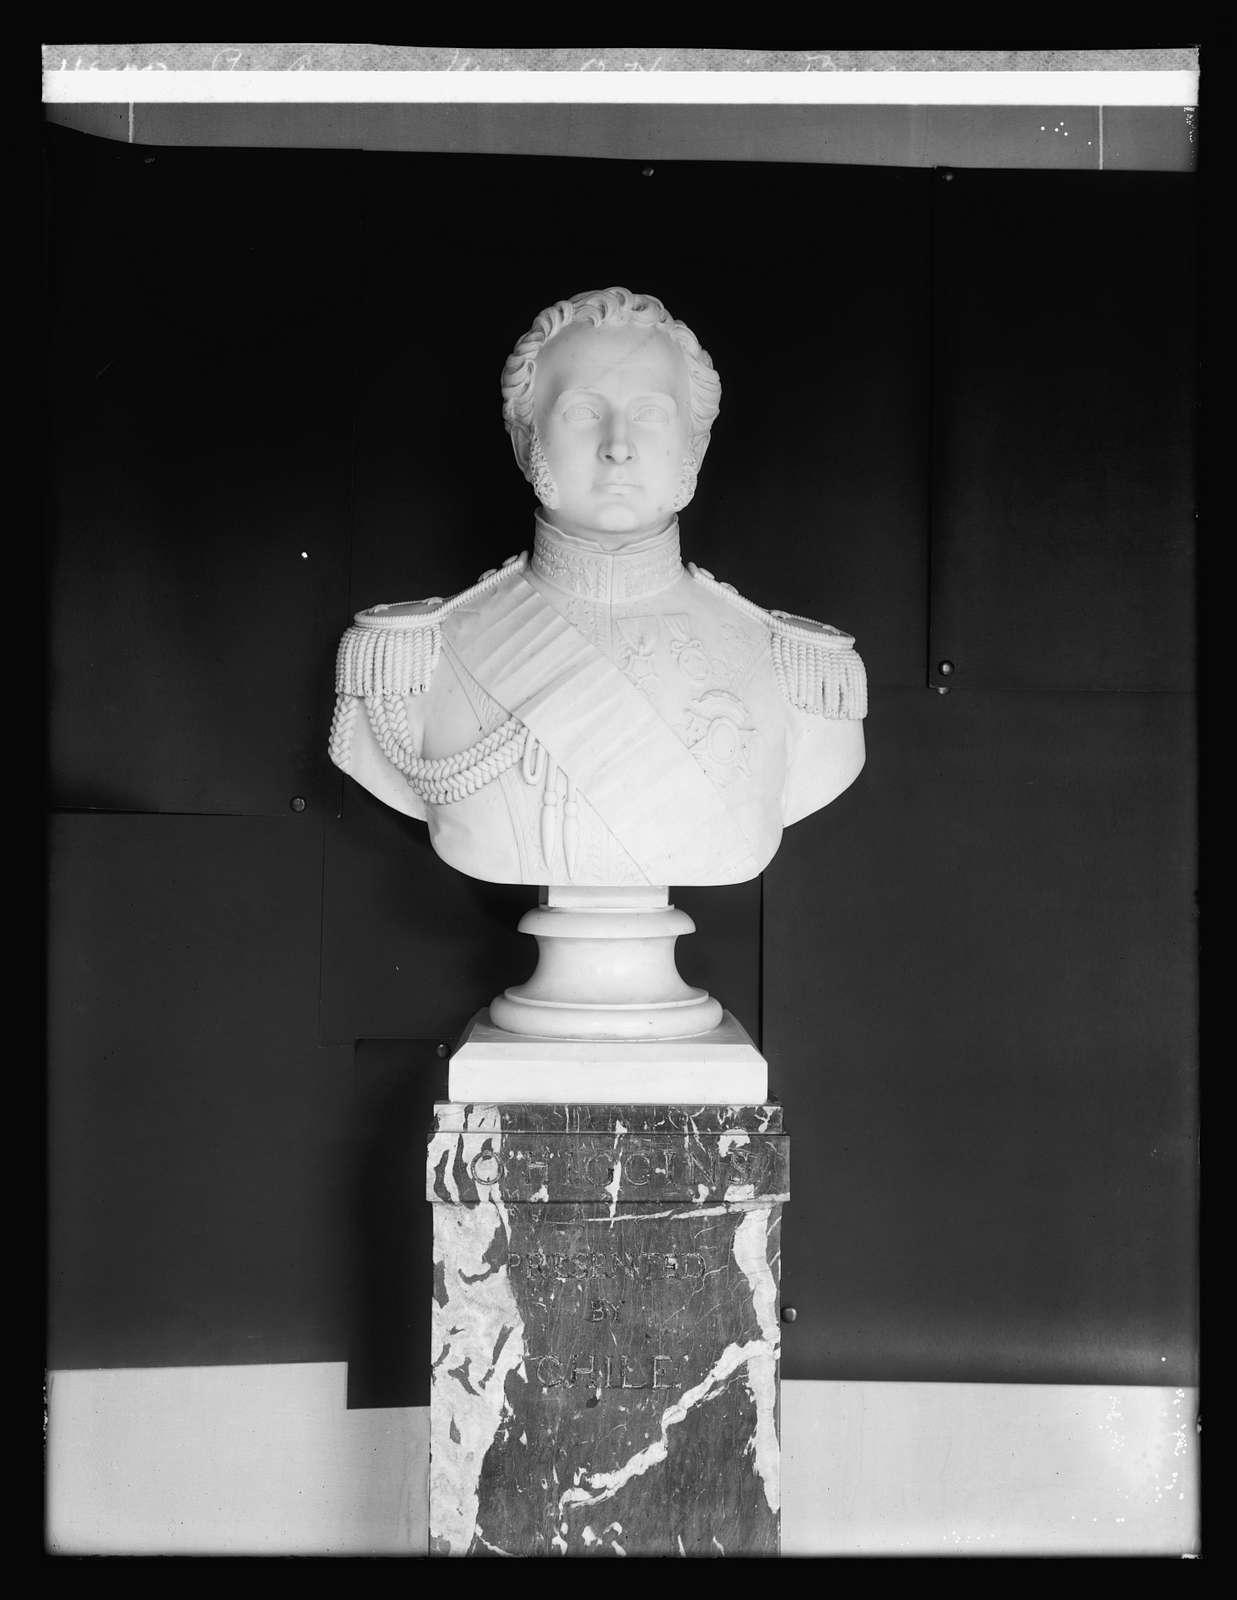 Pan American Union, O'Higgings bust, Washington, D.C.